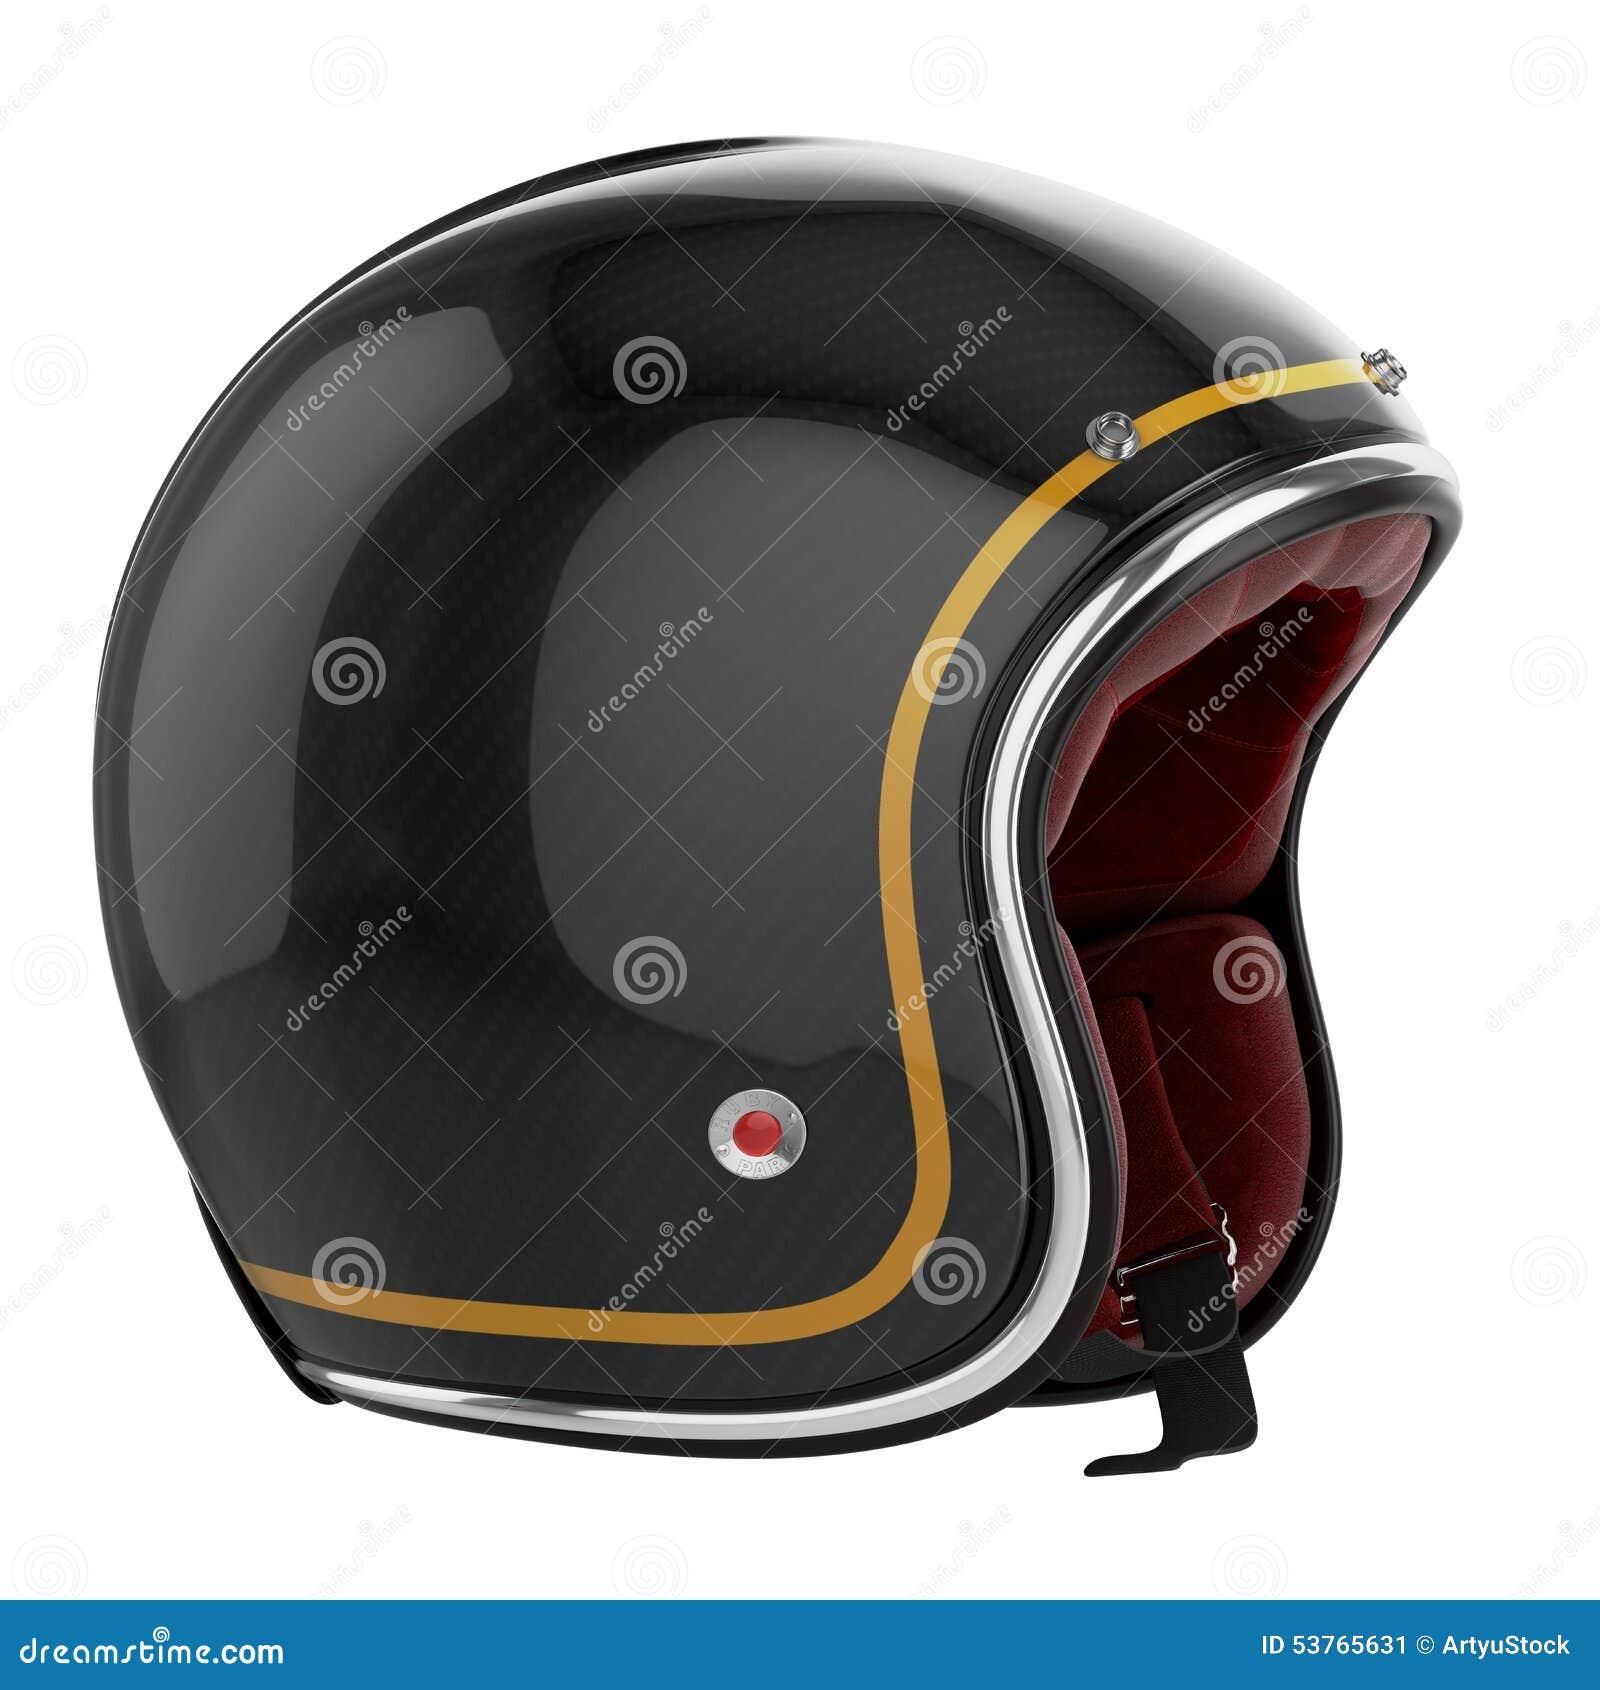 fibre de carbone de casque de moto illustration stock illustration du concepts plastique. Black Bedroom Furniture Sets. Home Design Ideas